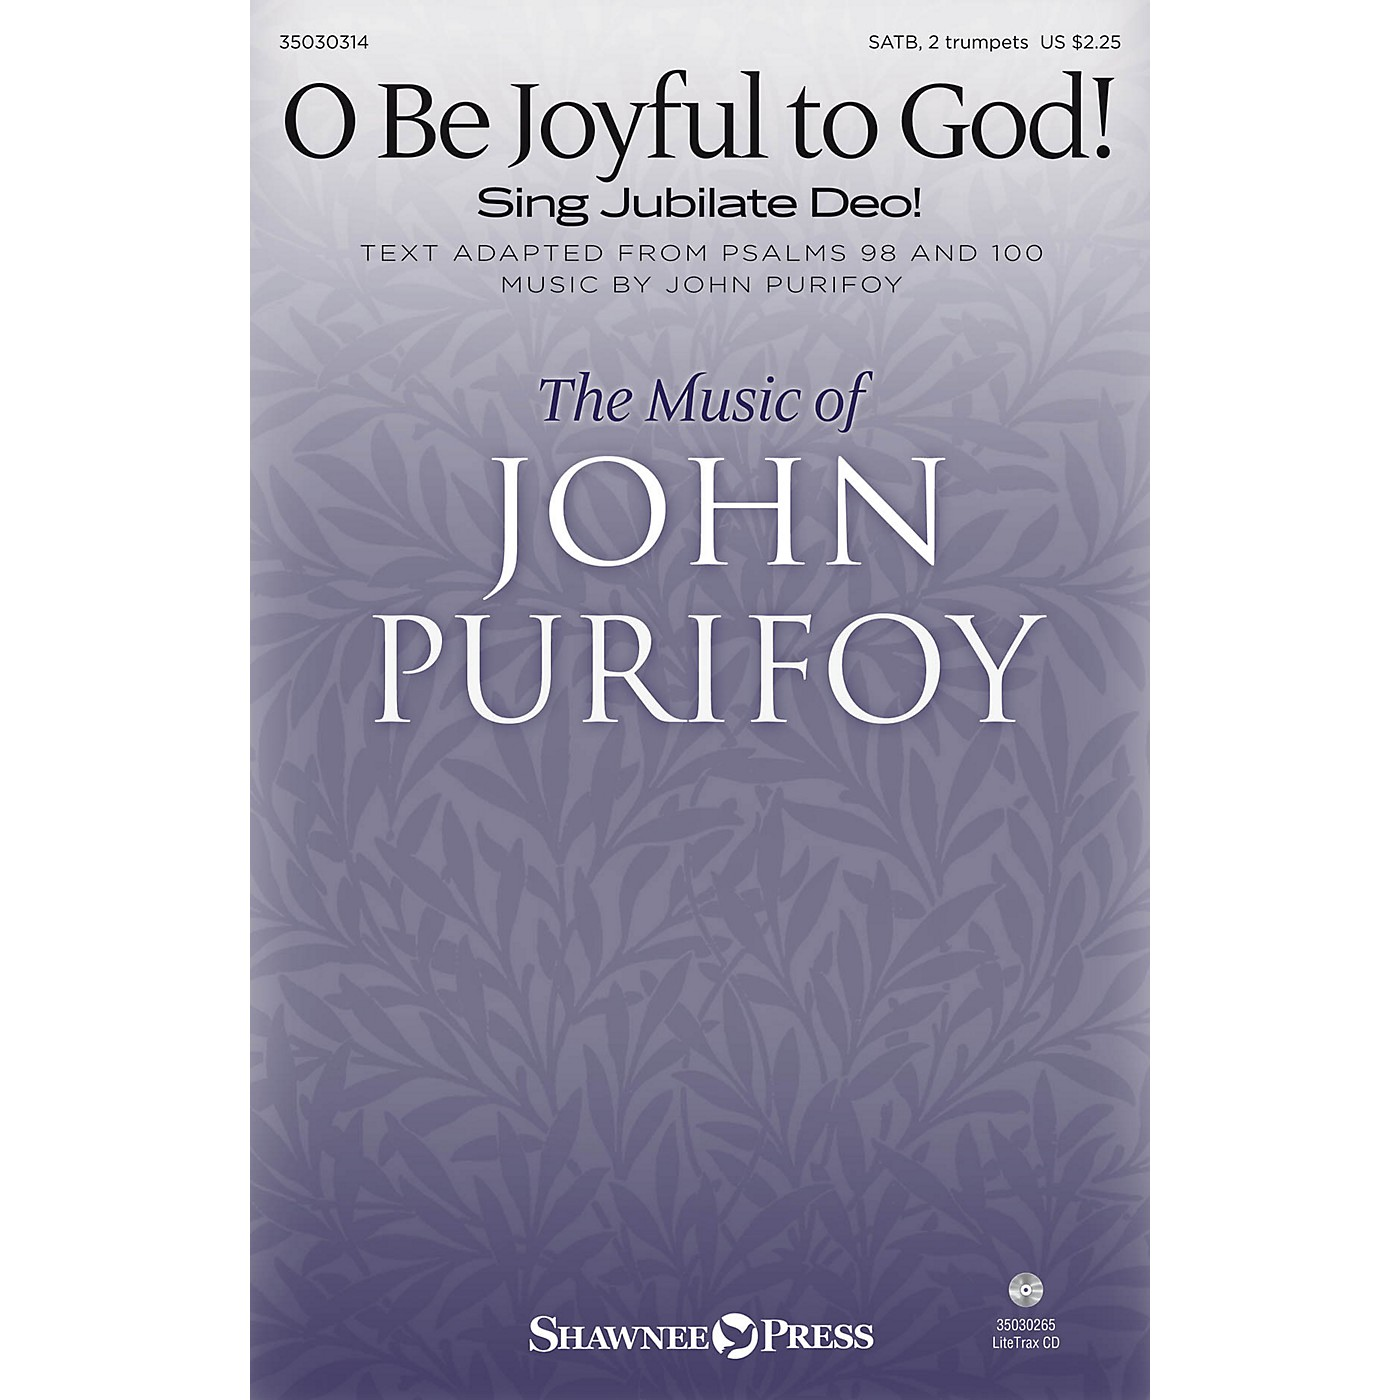 Shawnee Press O Be Joyful to God! (Sing Jubilate Deo!) SATB/2 TRUMPETS composed by John Purifoy thumbnail